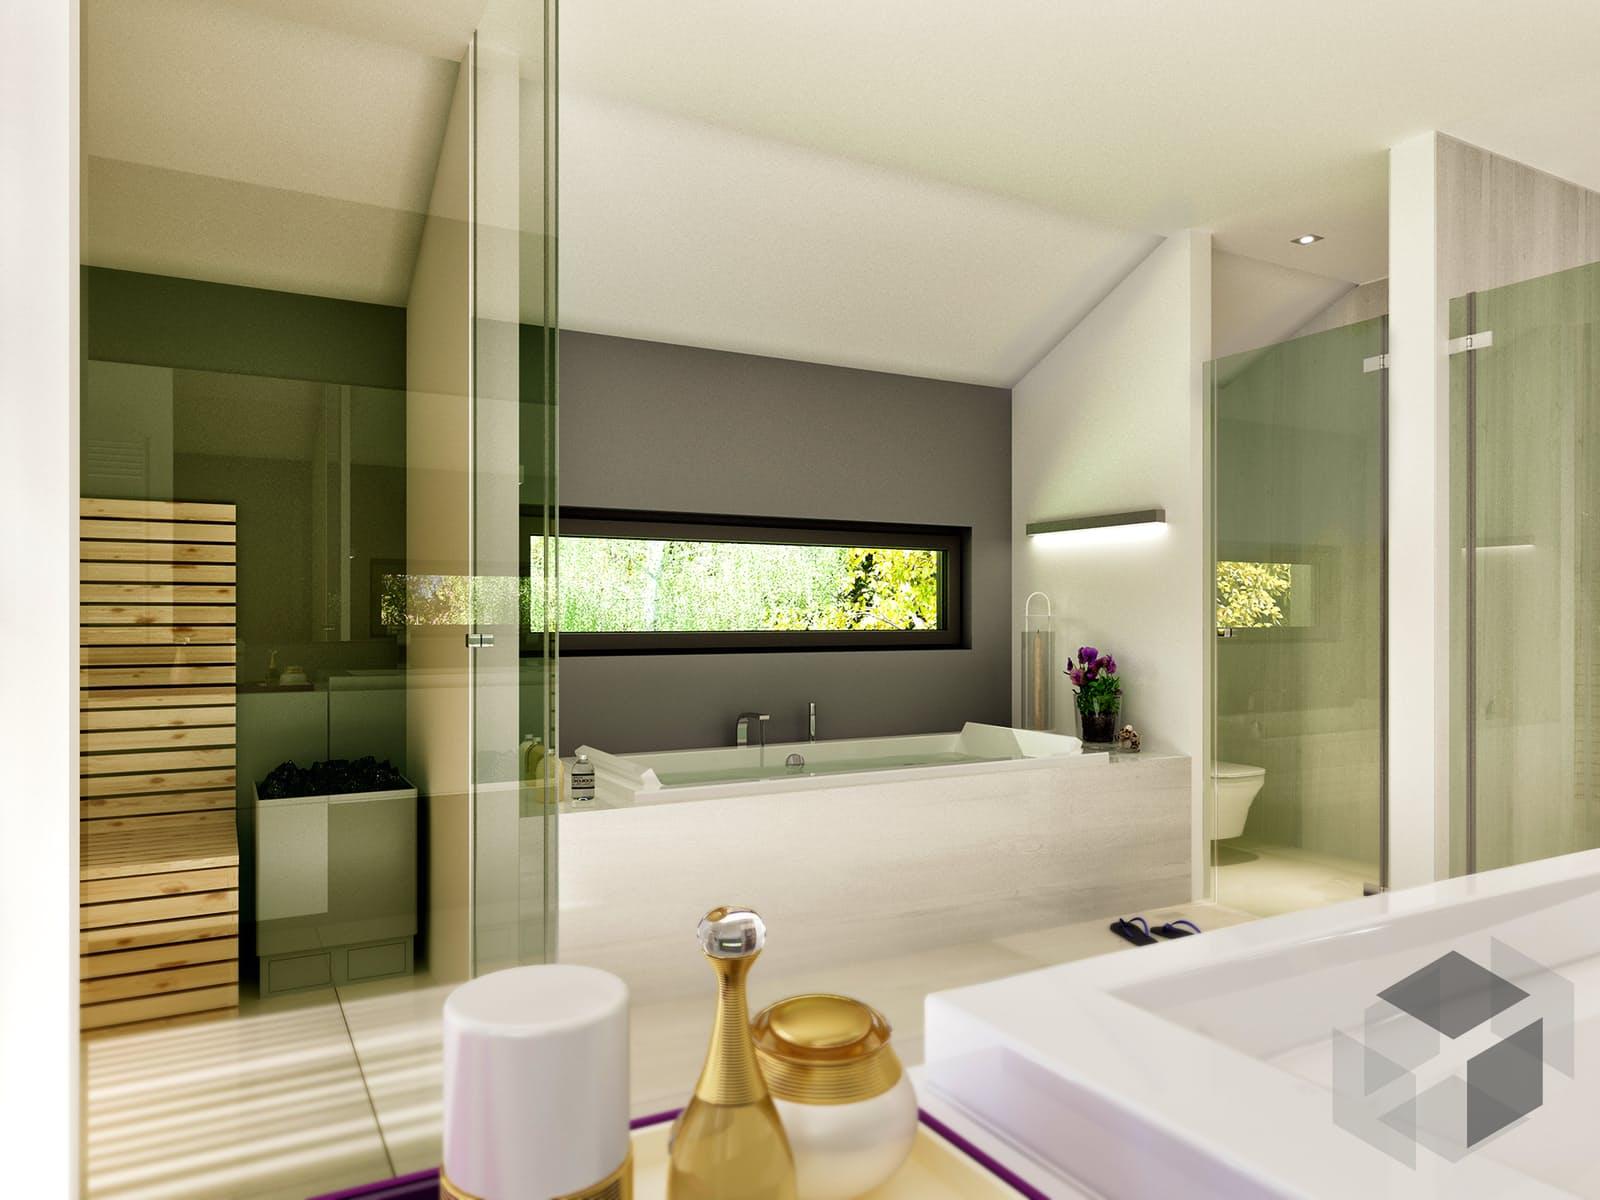 concept m 211 von bien zenker komplette daten bersicht. Black Bedroom Furniture Sets. Home Design Ideas